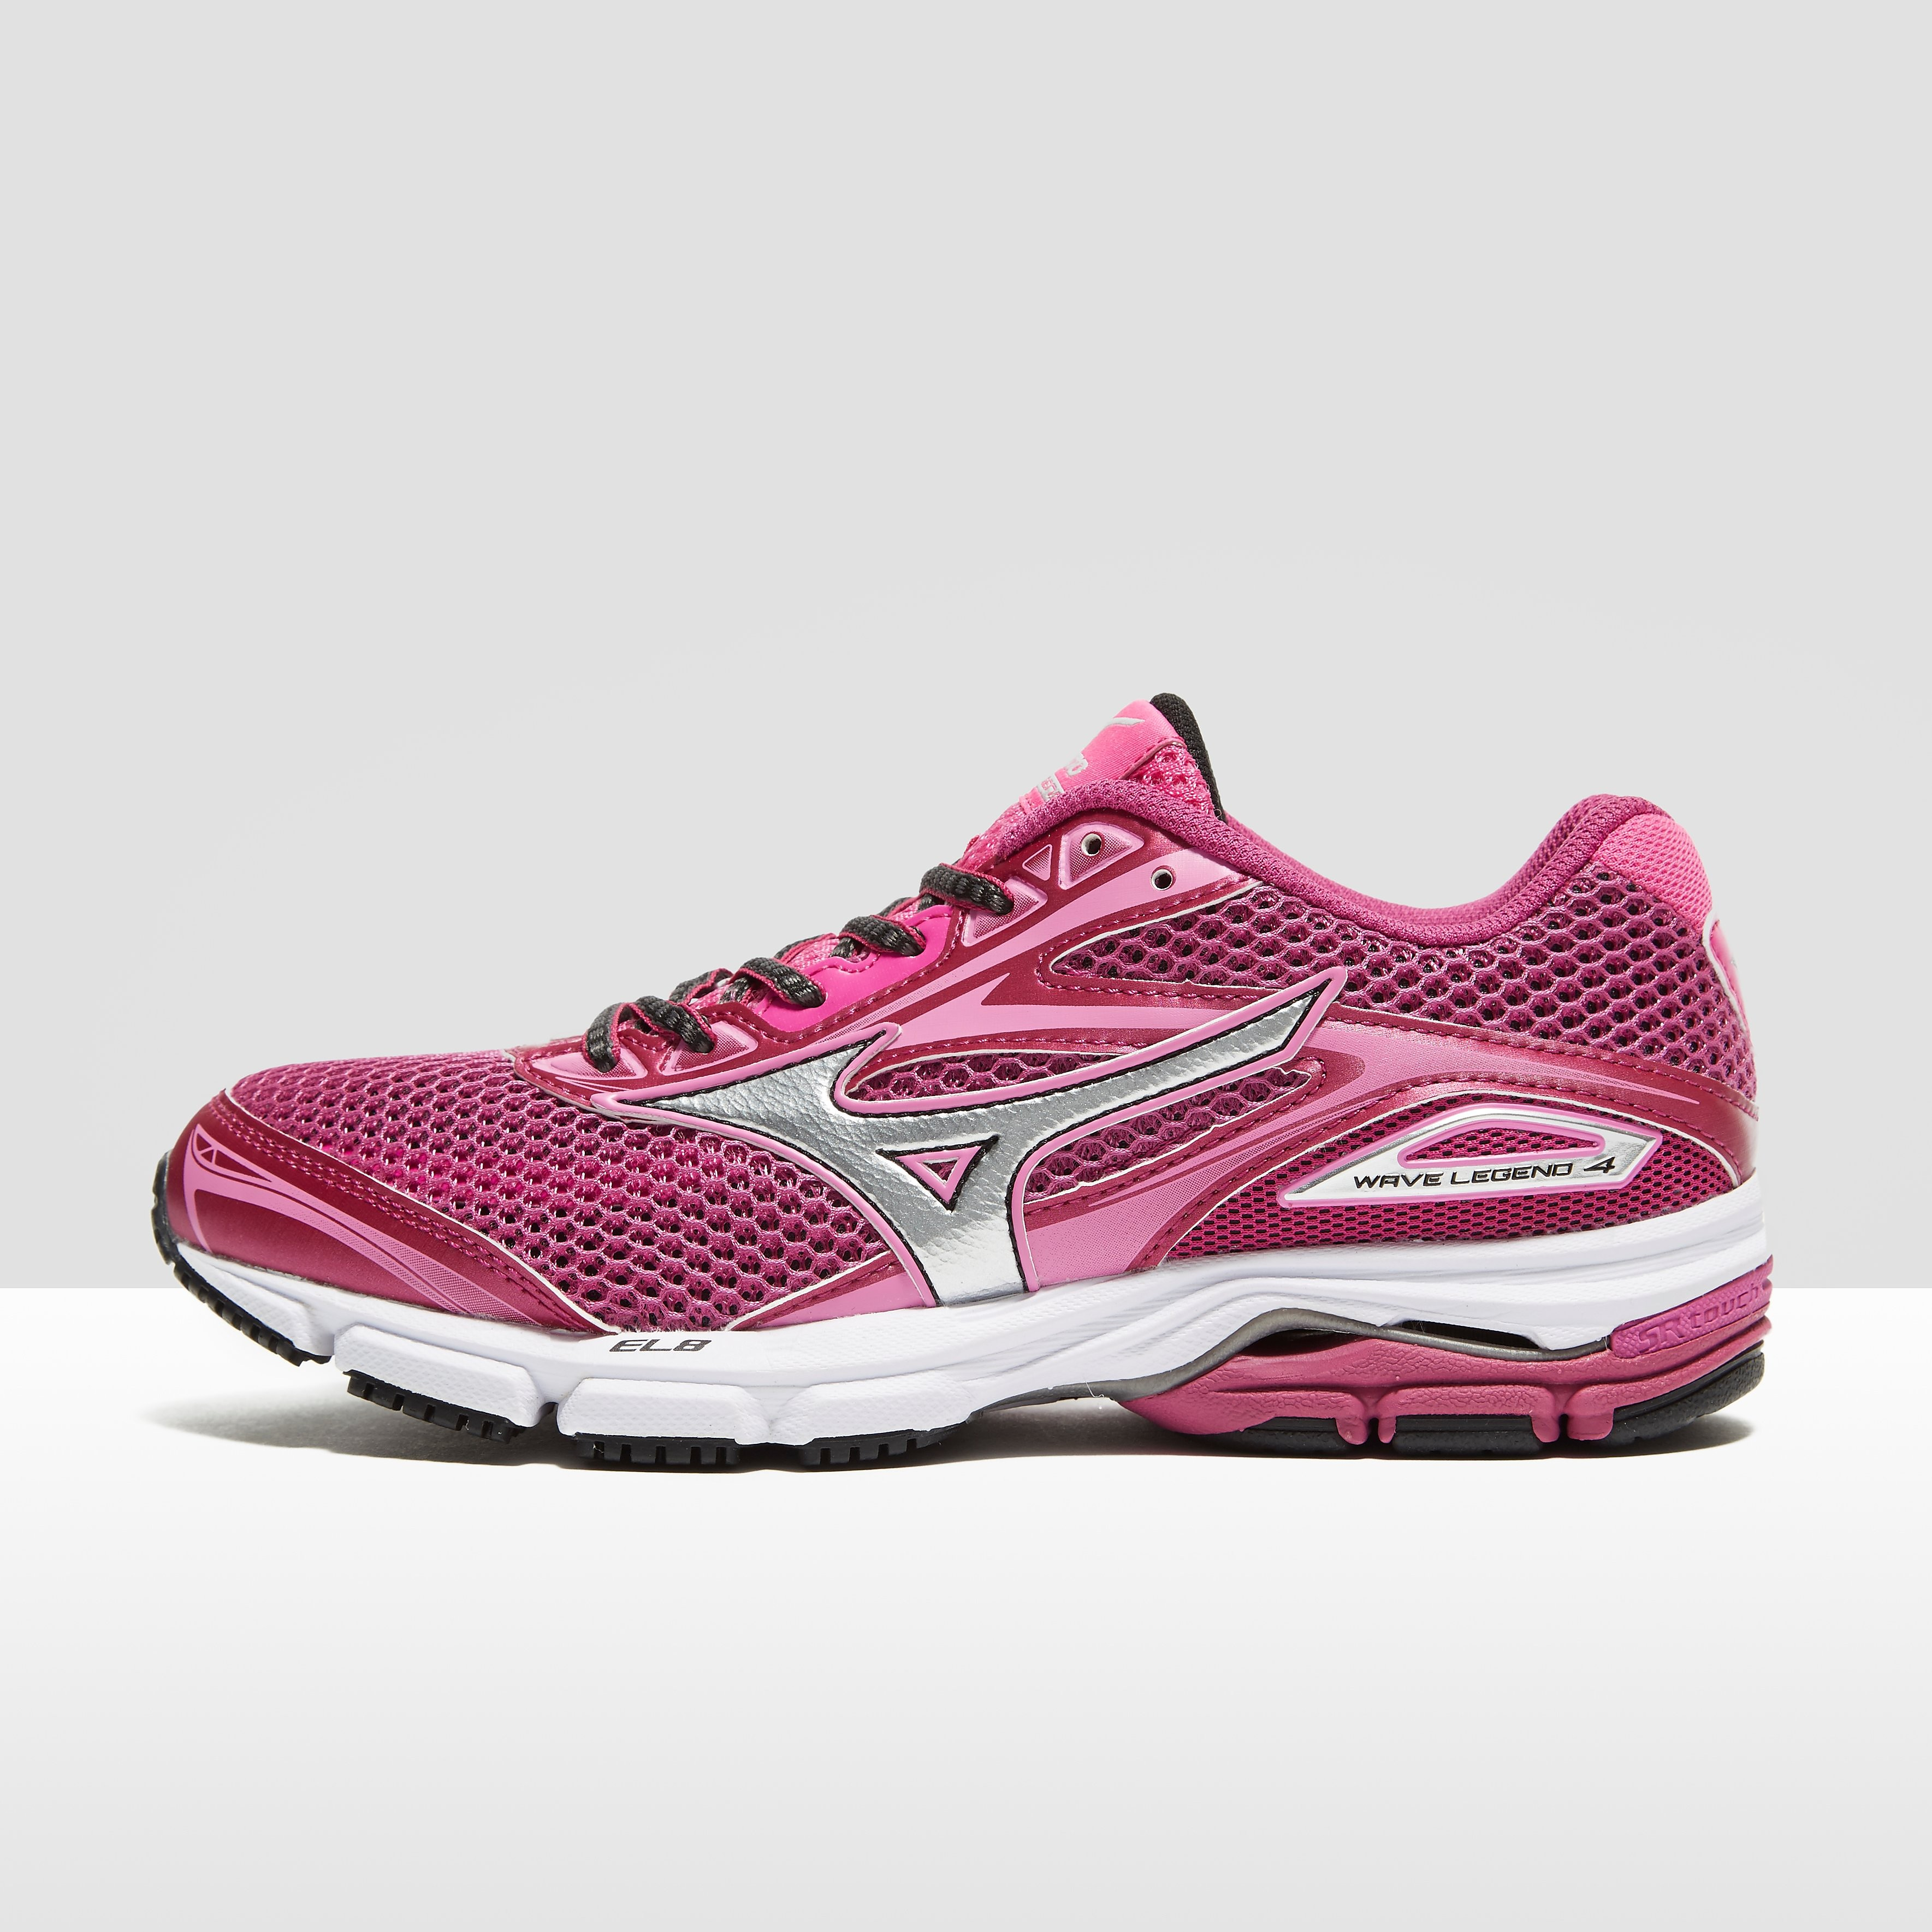 Mizuno Wave Legend 4 Women's Running Shoes